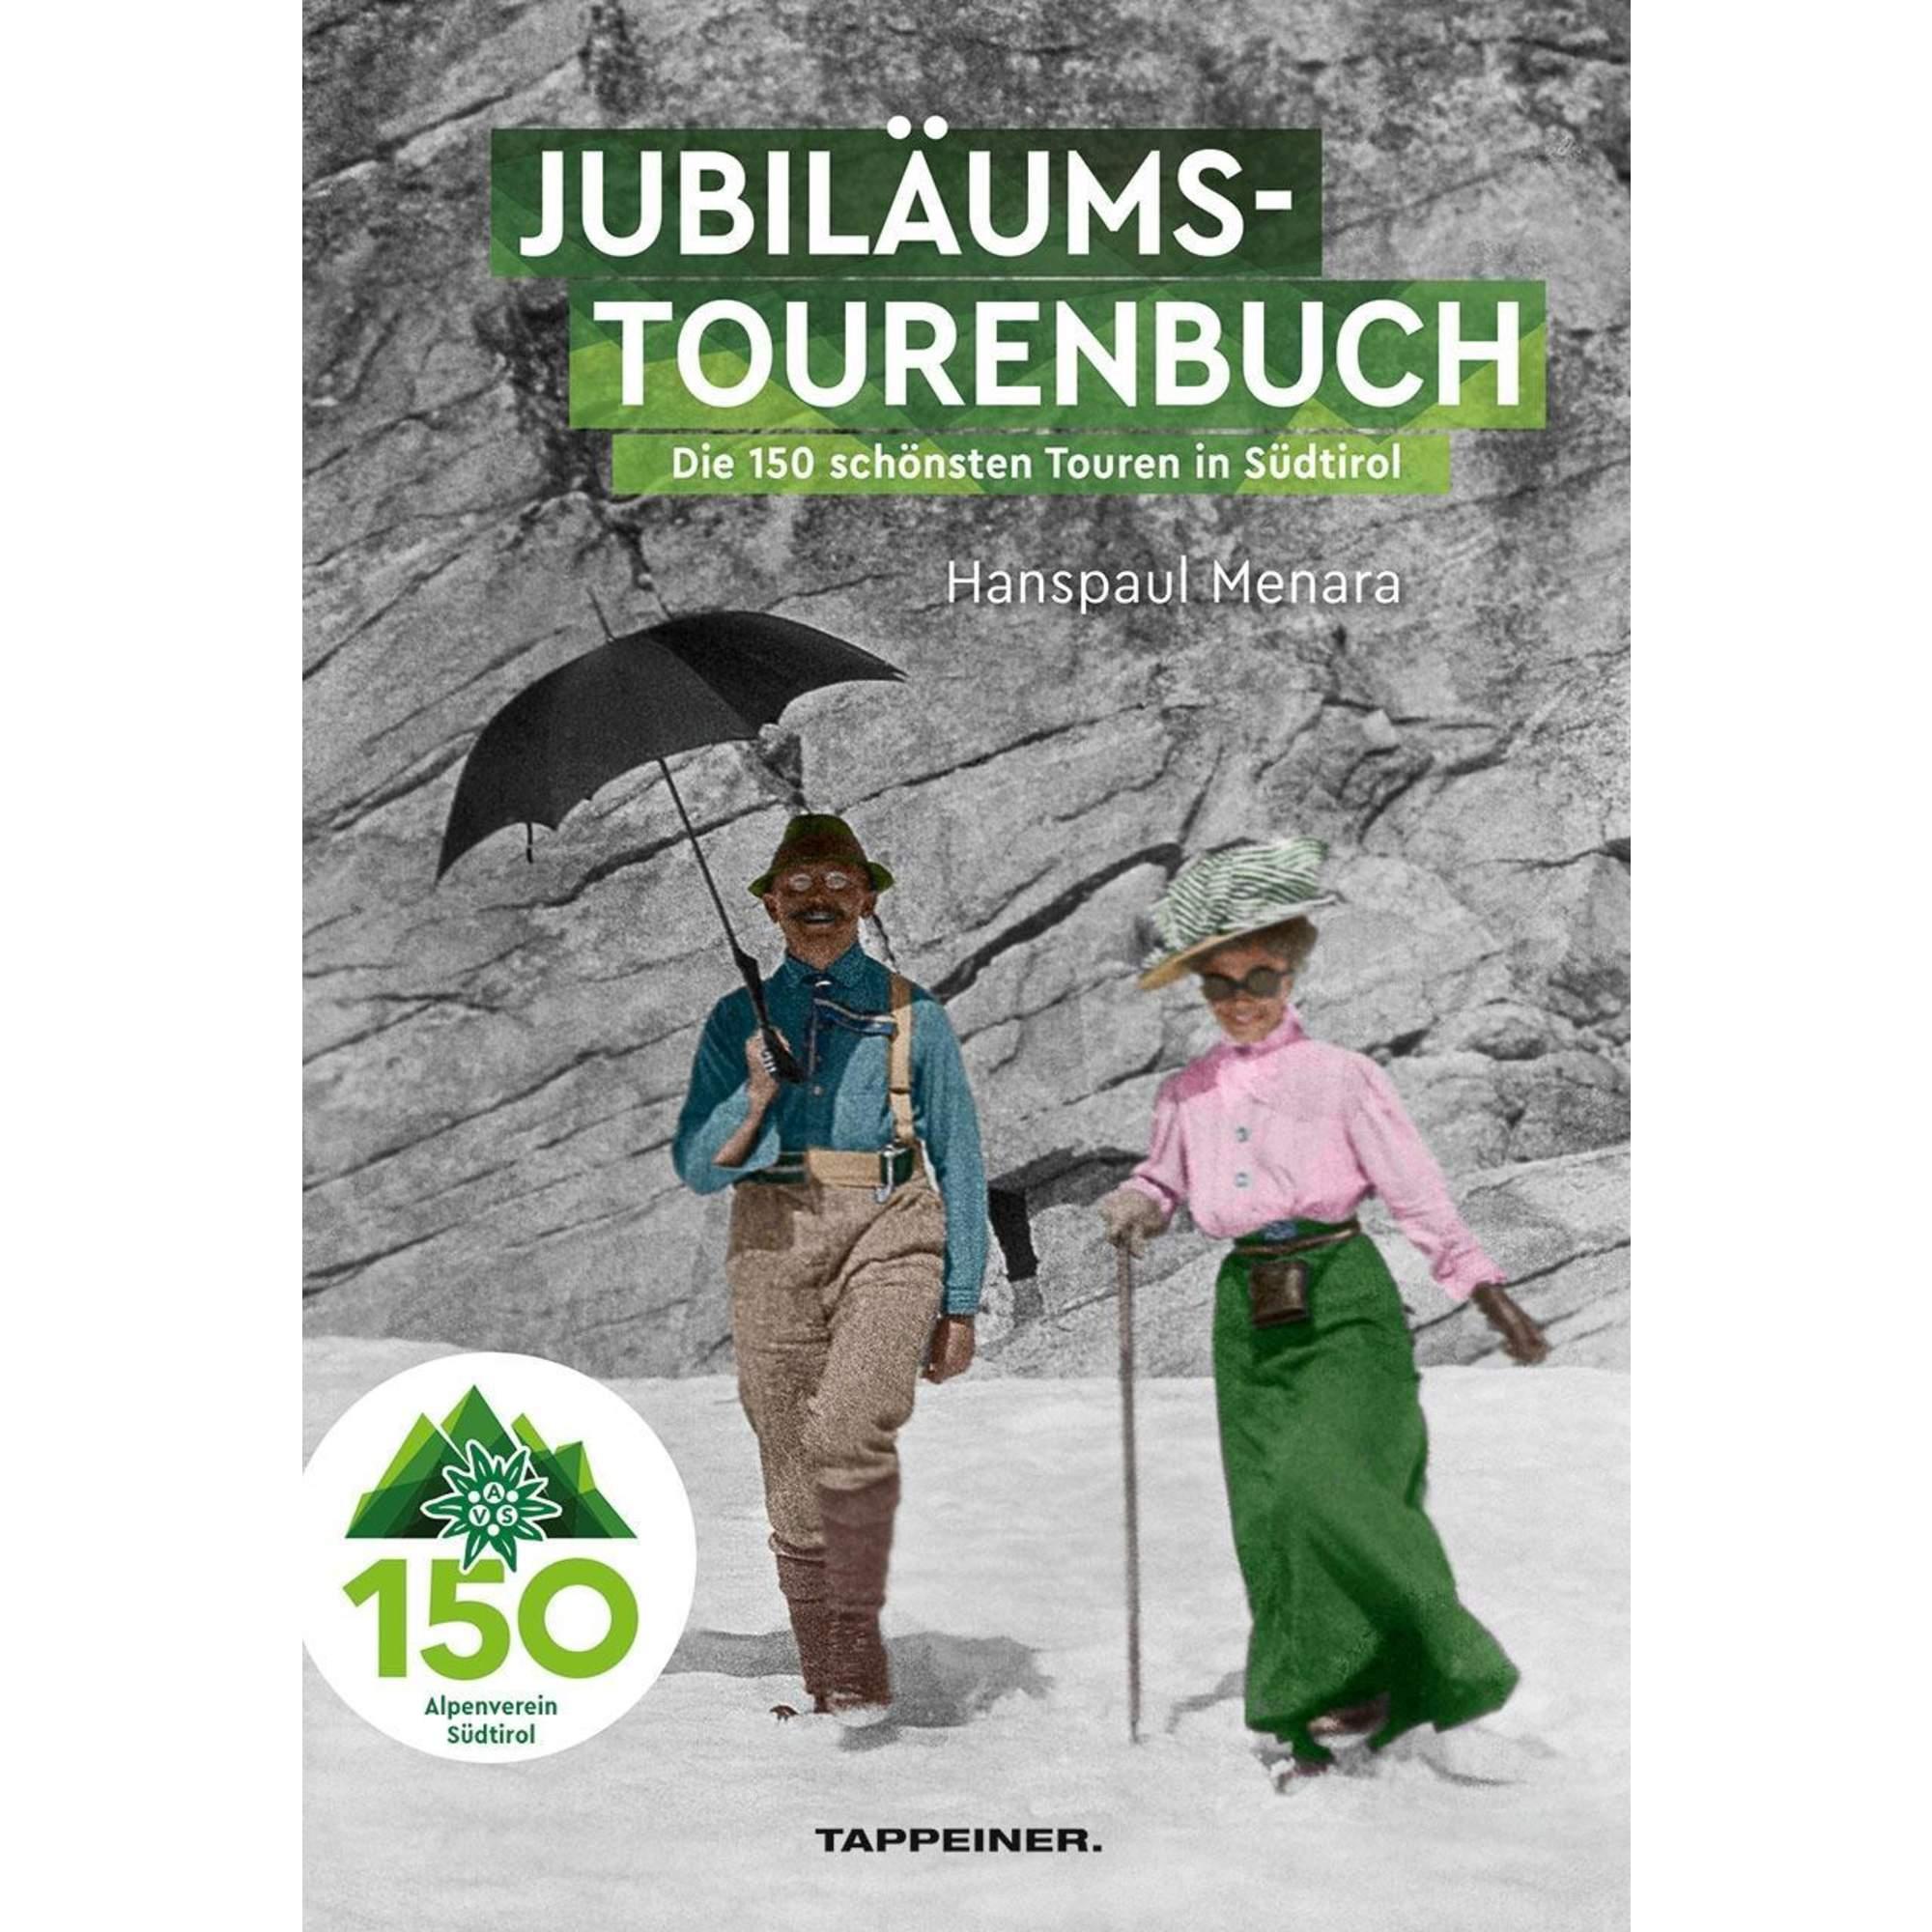 AVS-Jubiläumstourenbuch - 150 Jahre Alpenverein Südtirol, 24,90 Euro